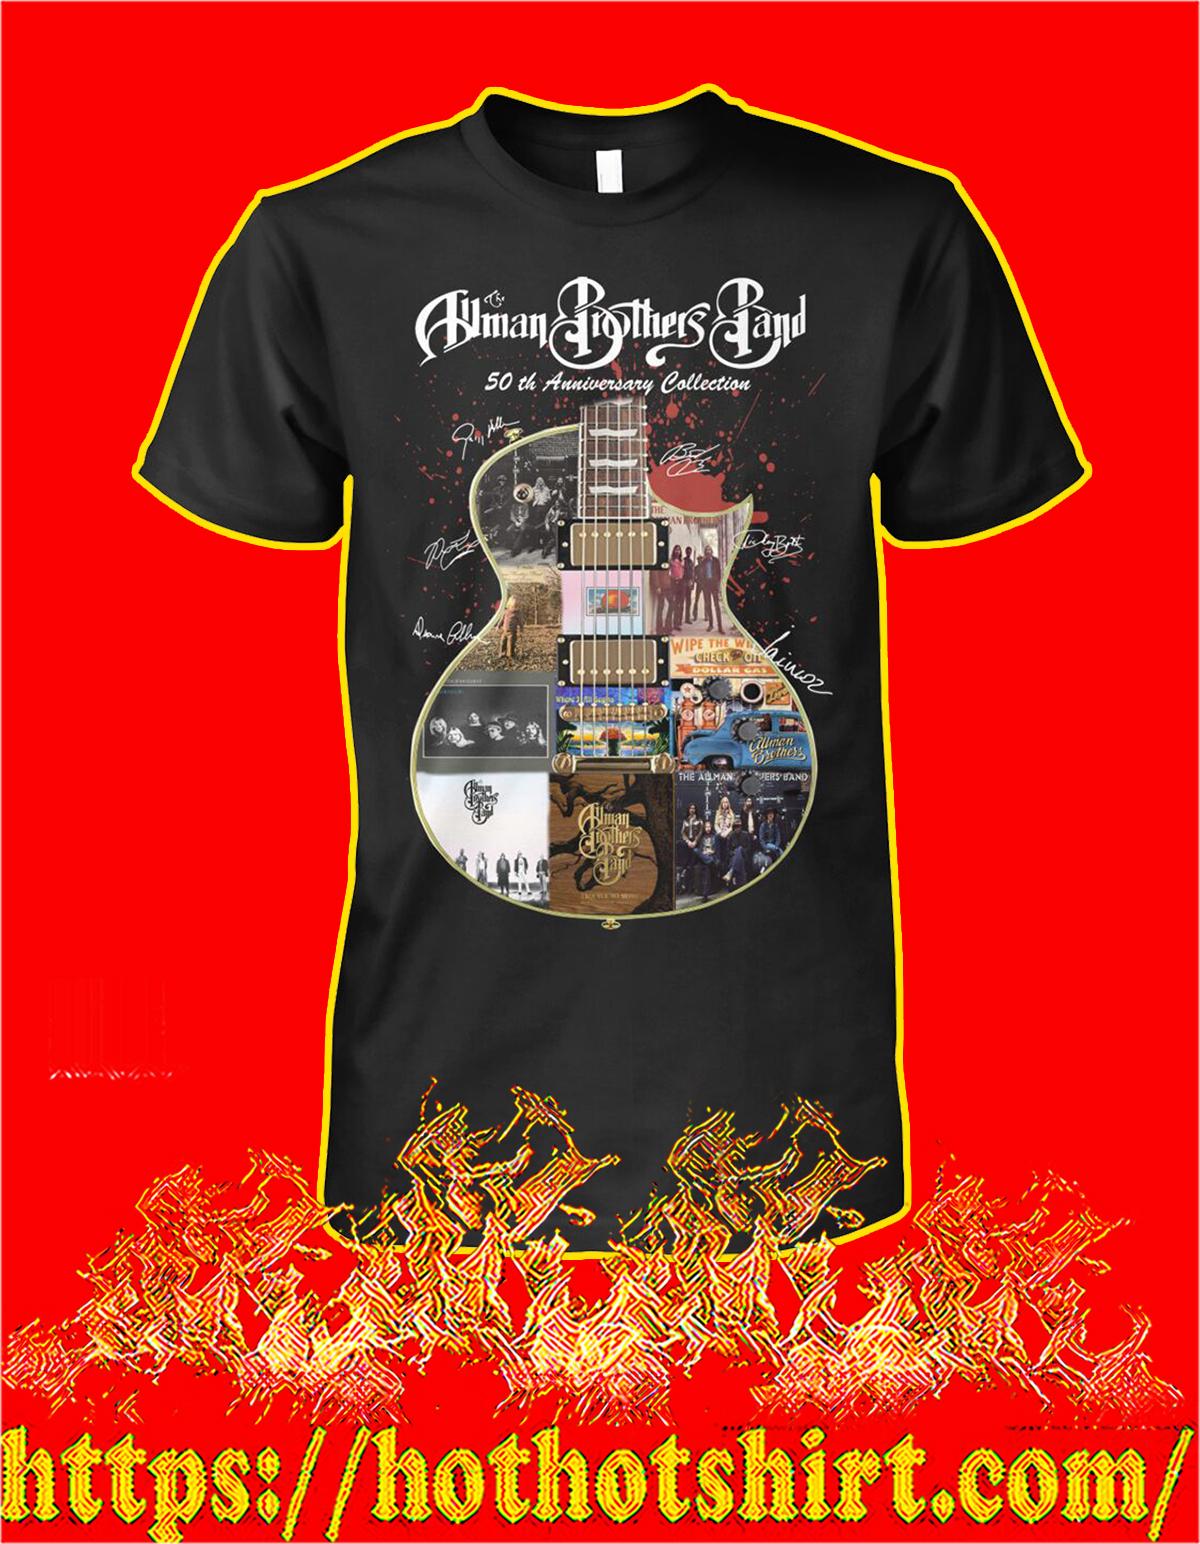 Allman brothers band 50th anniversary collection guitar signature shirt